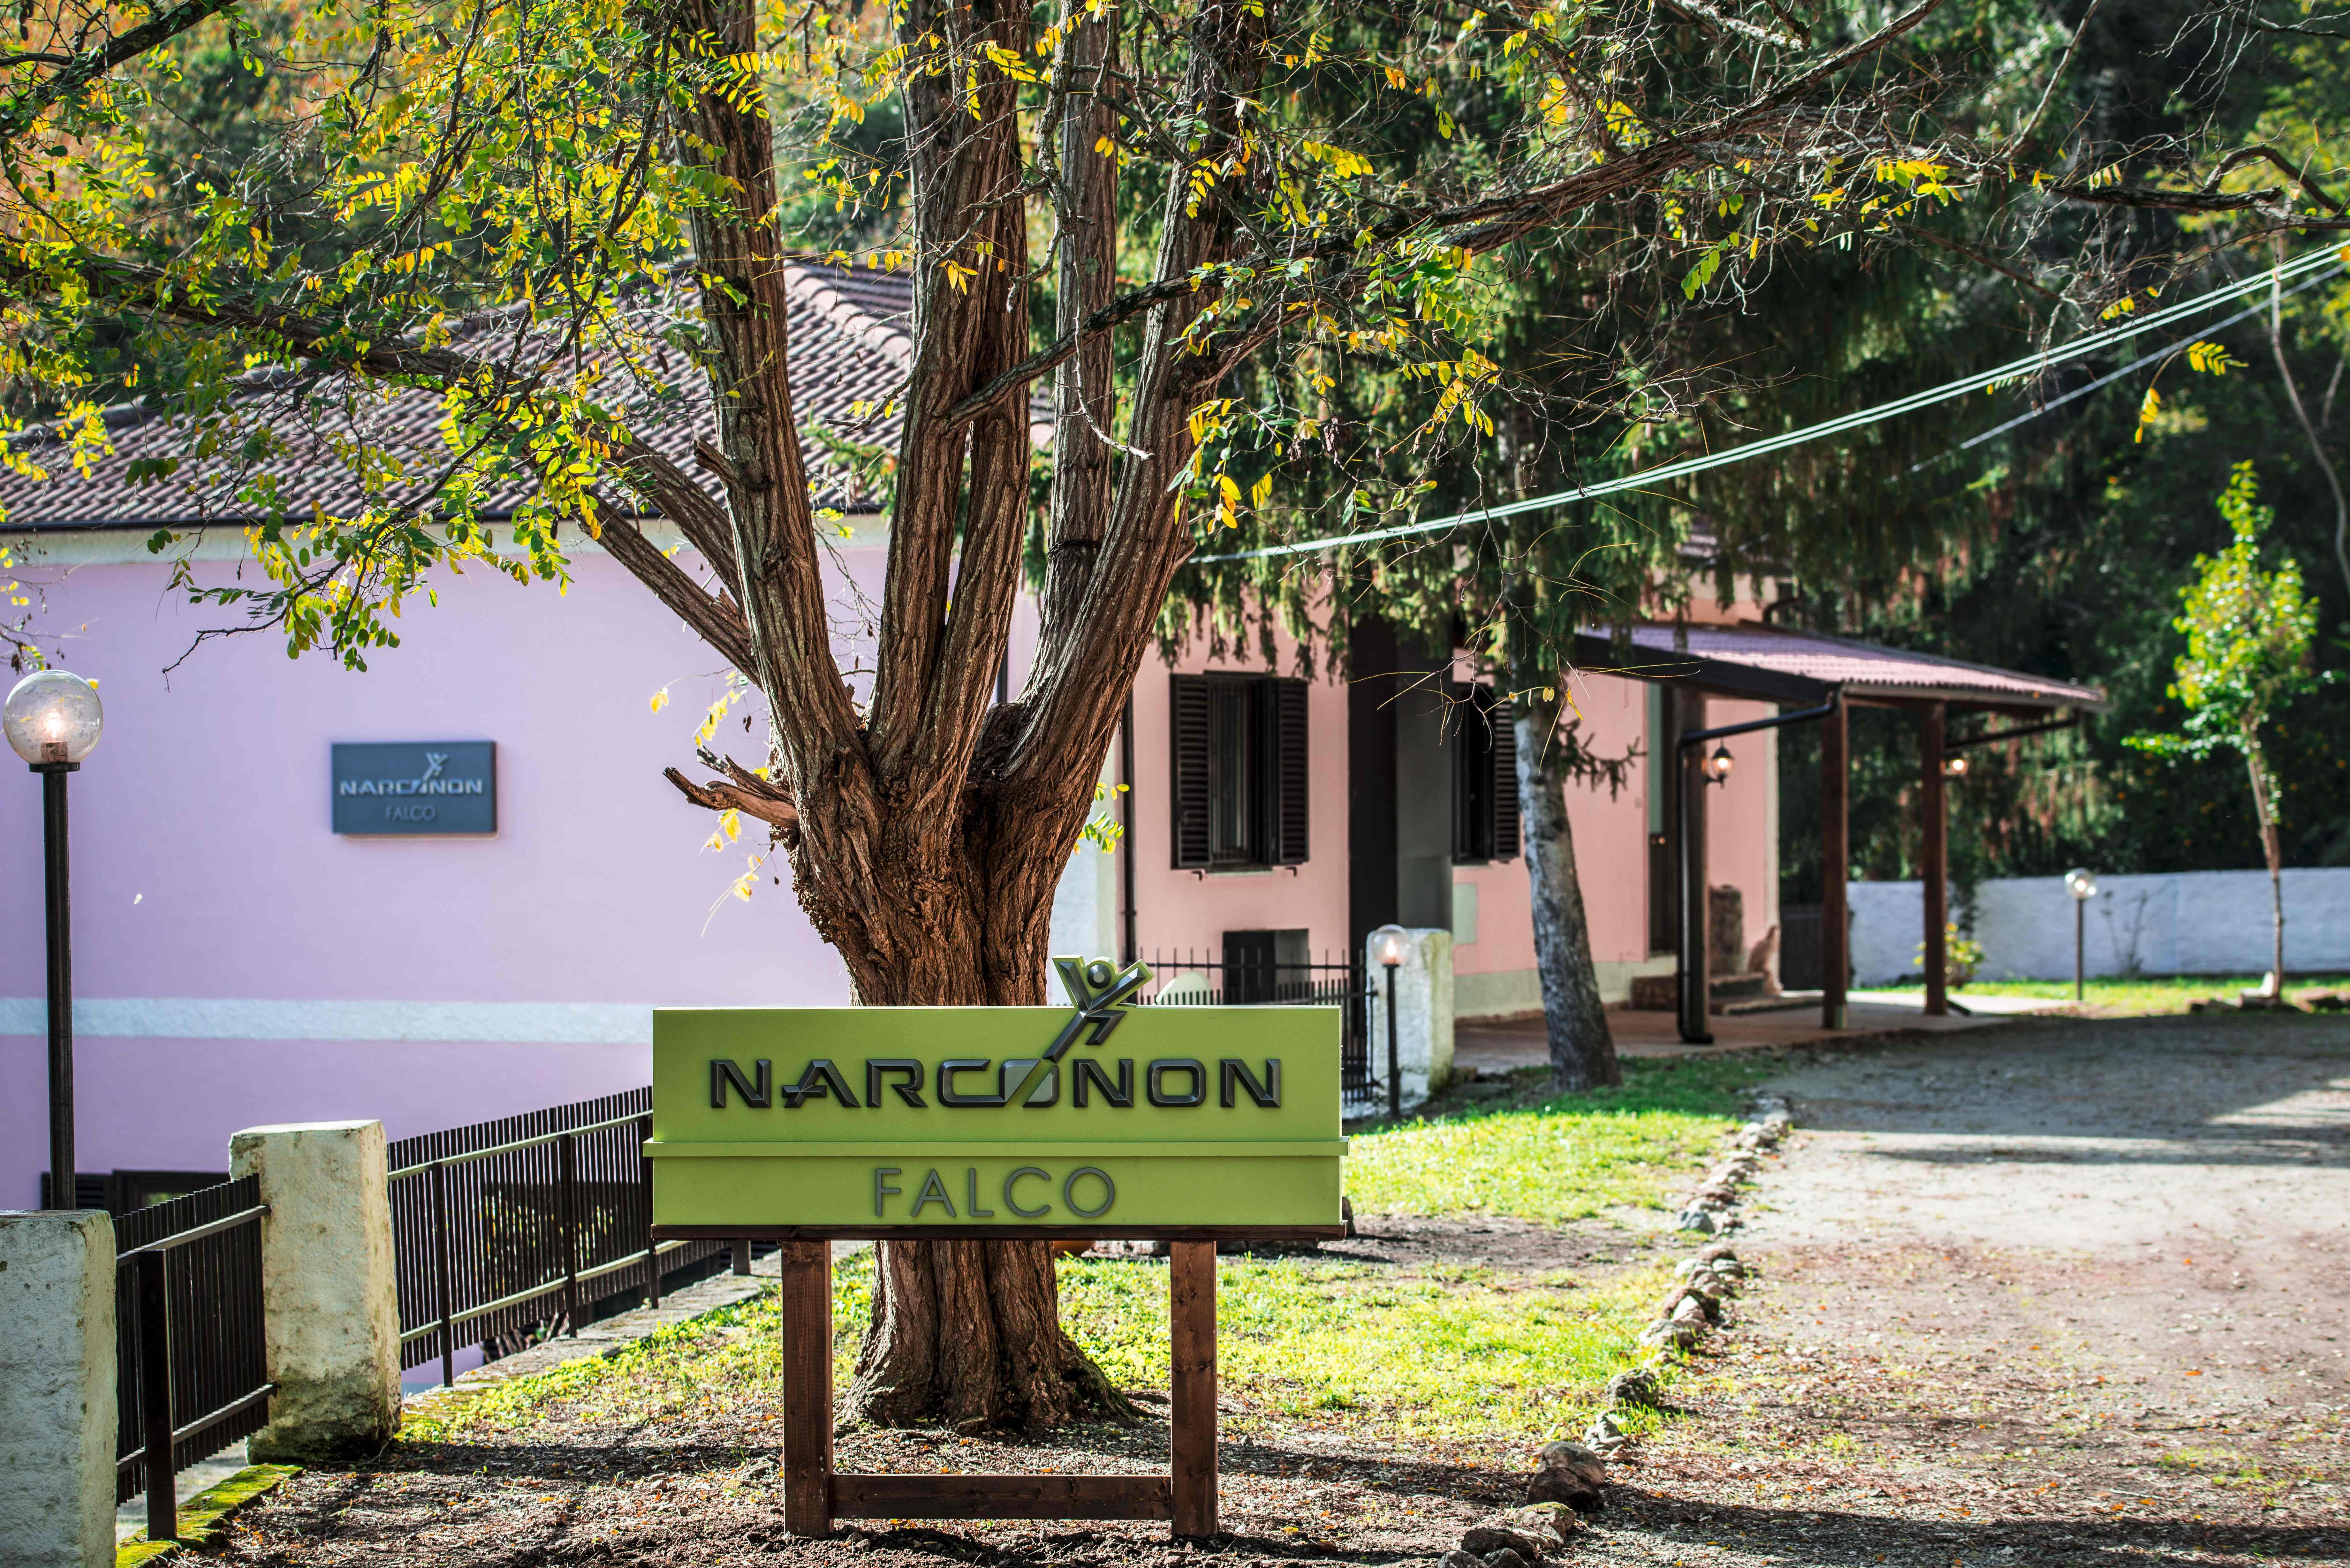 Centro Narconon Falco